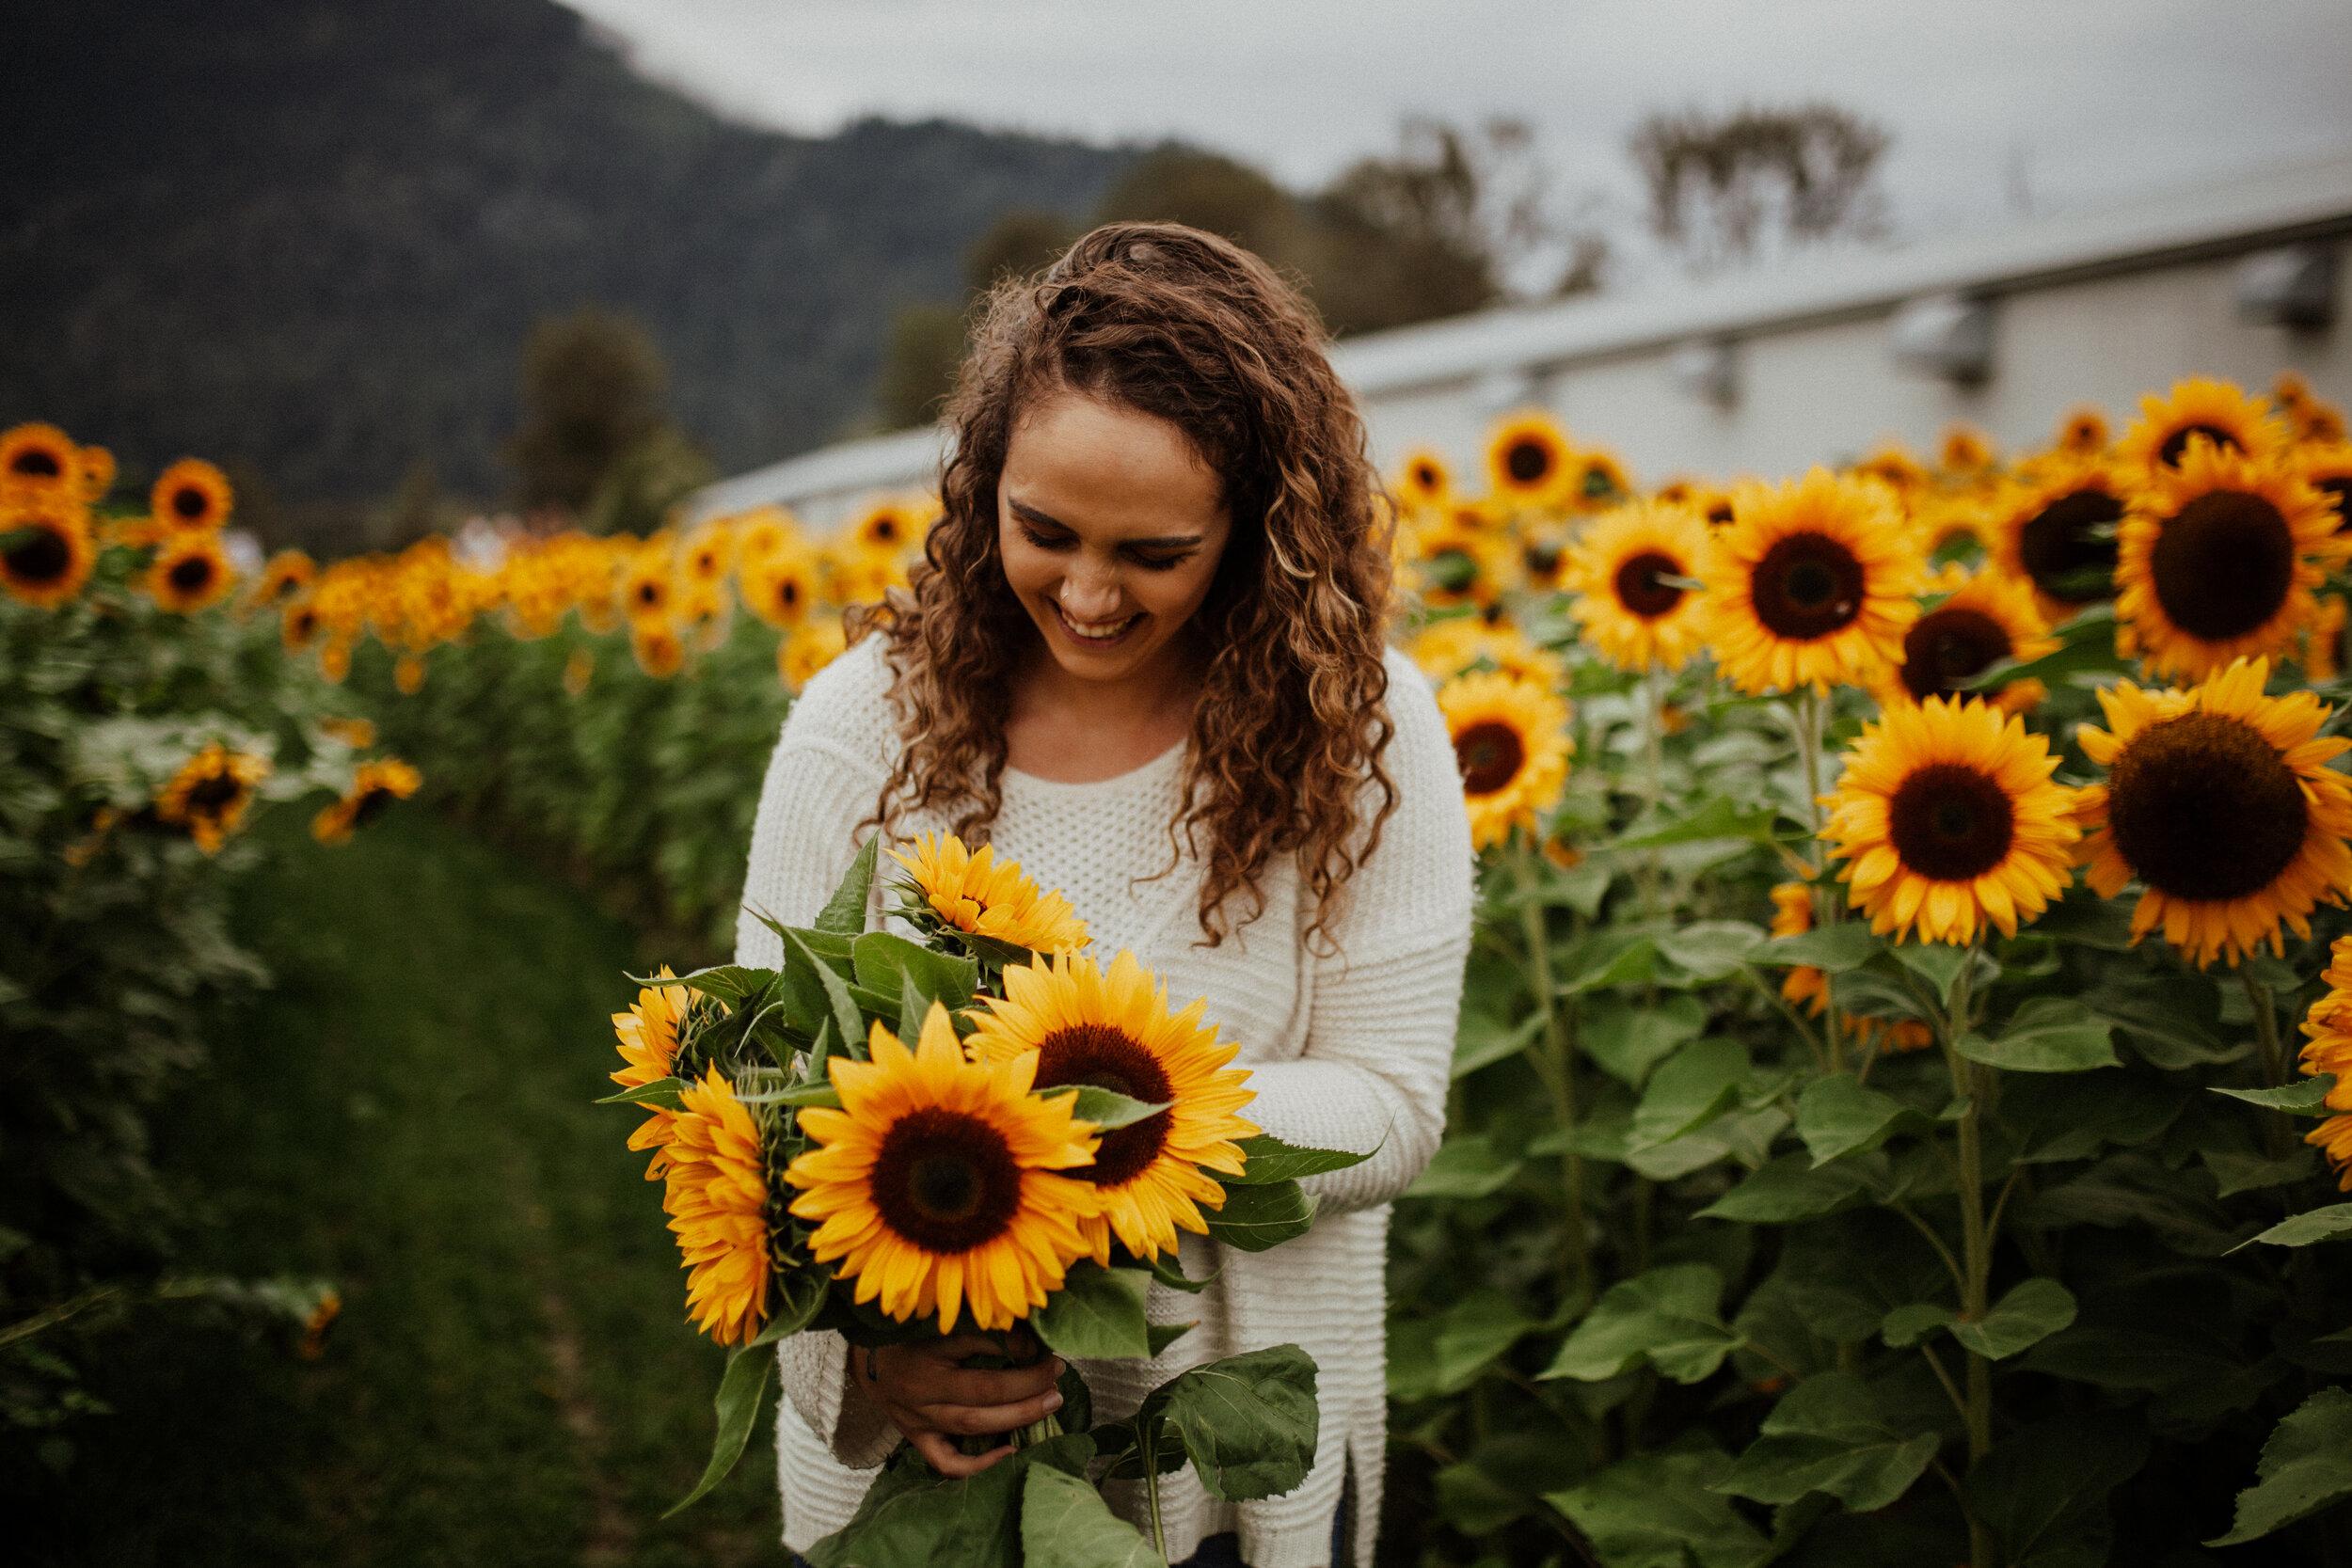 SunflowerFestival-41.jpg